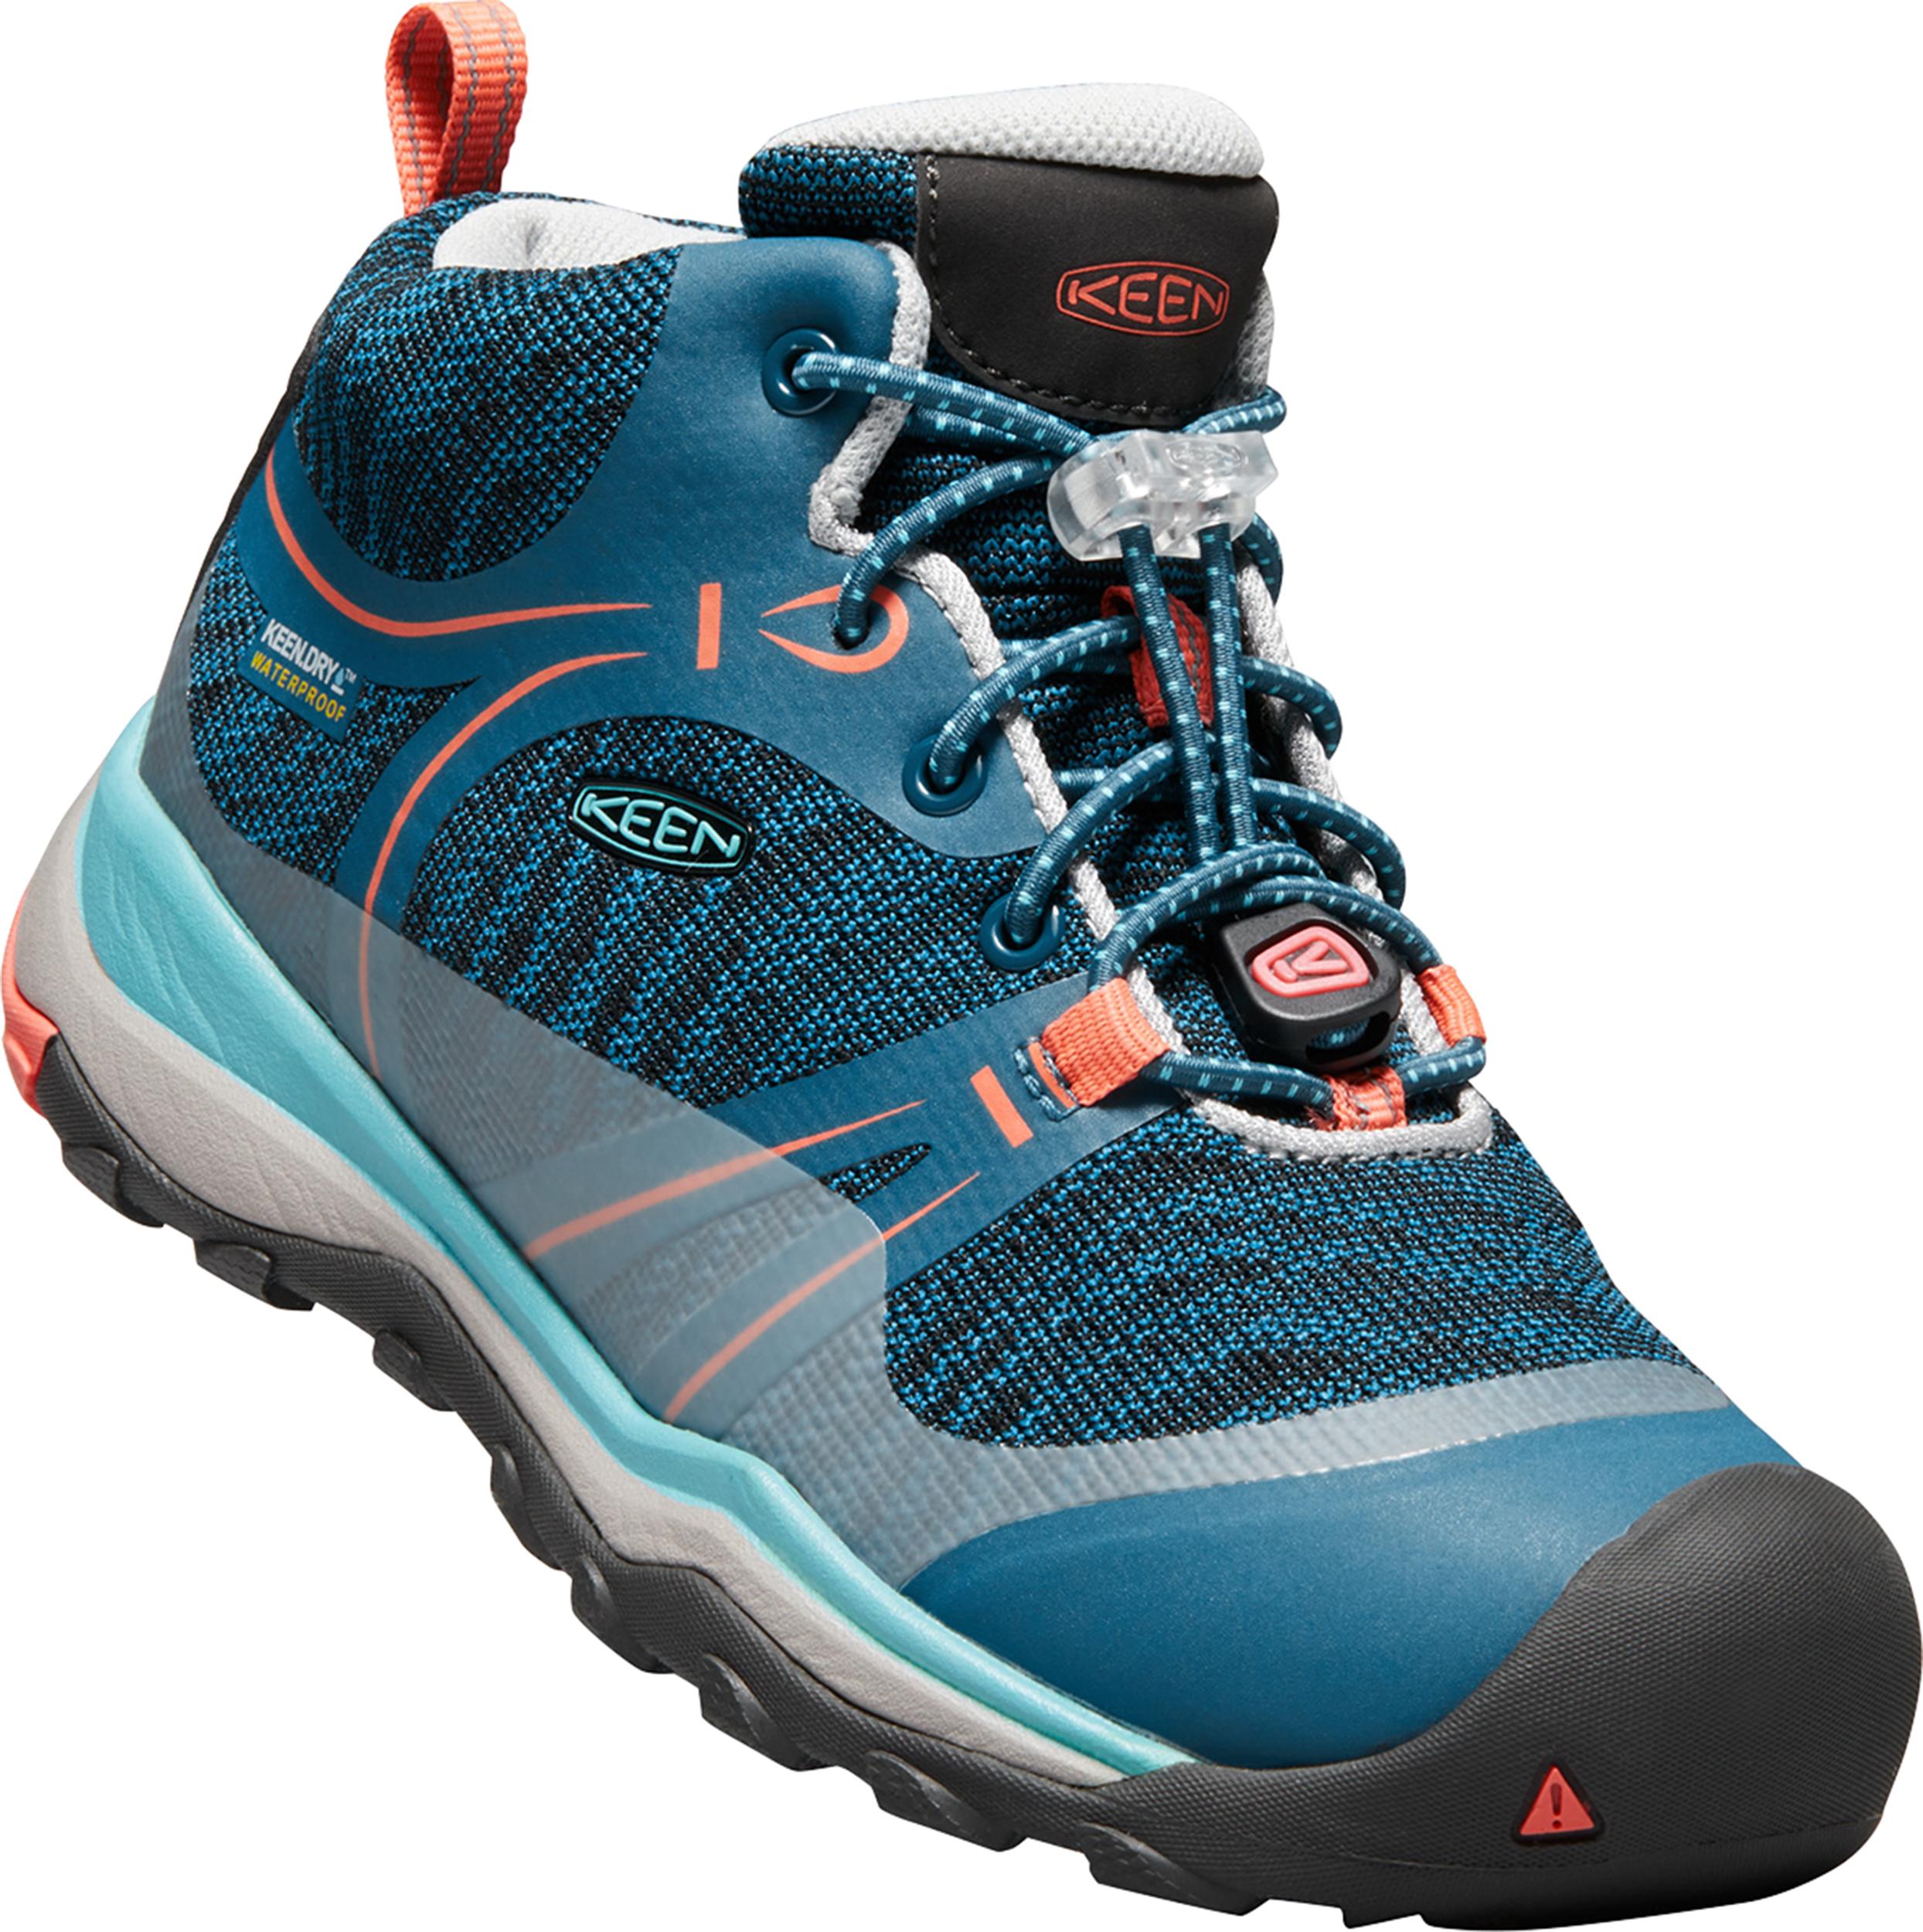 Boys' Shoes Professional Sale Vasque Us 5 Eu 37 Kids Boys Monolith Low Ultradry Waterproof Trail Hiking Shoes